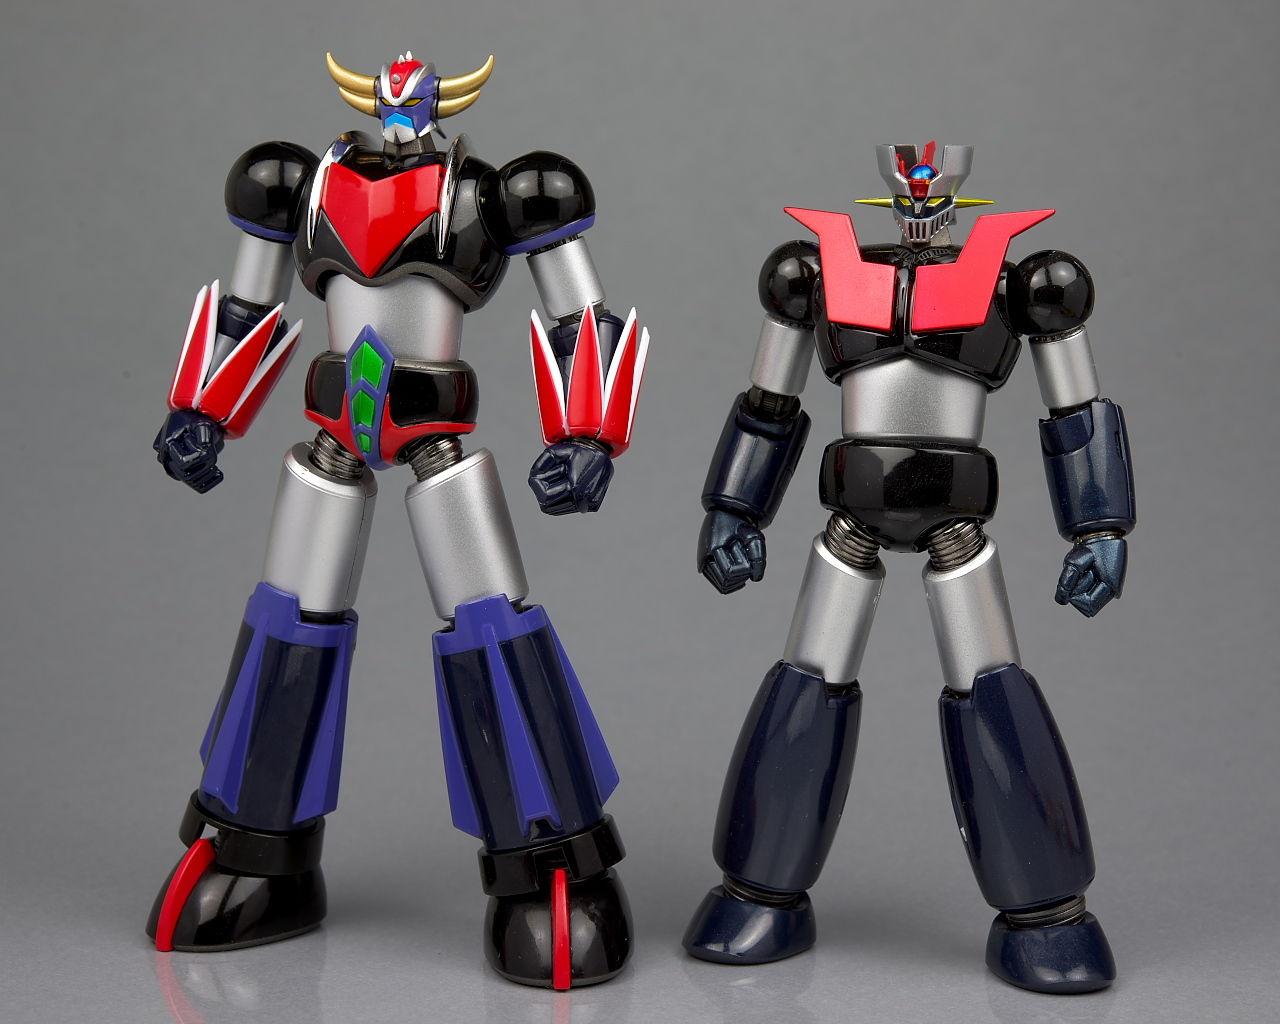 [SRC] Super Robot Chogokin Grendizer: Full Photoreview No ...